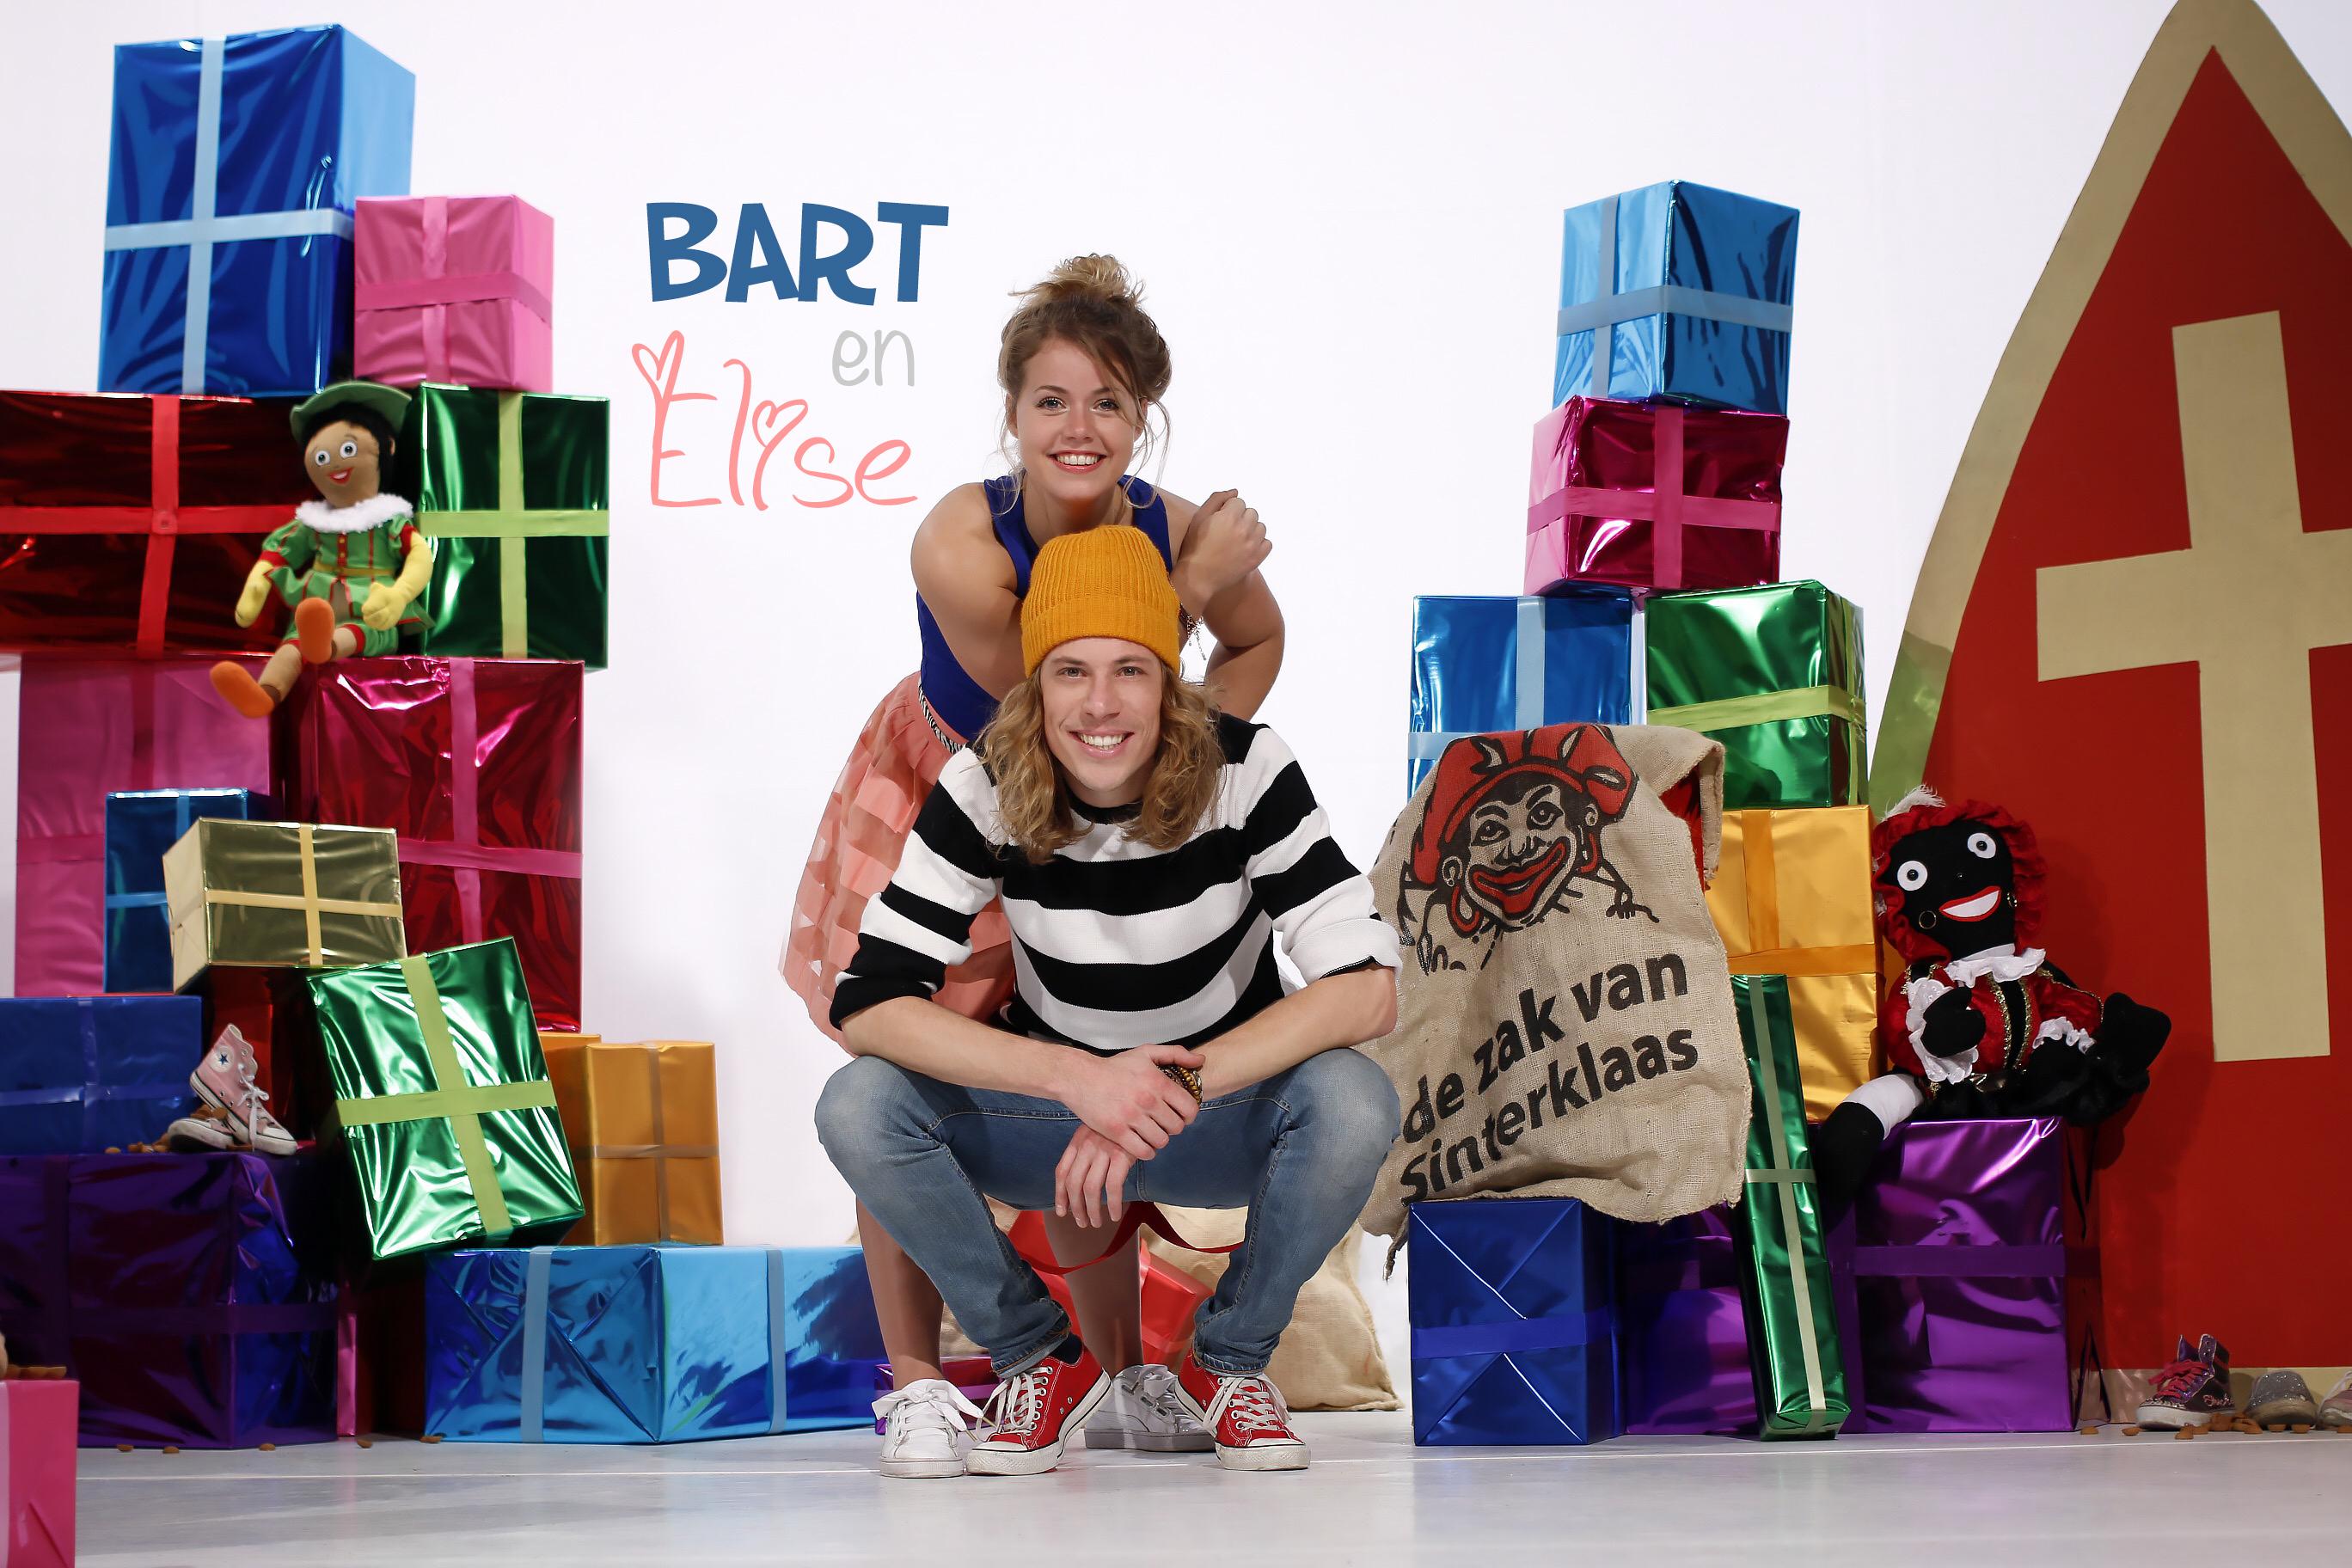 Sinterklaasshow Bart en Elise (zonder tekst).jpeg